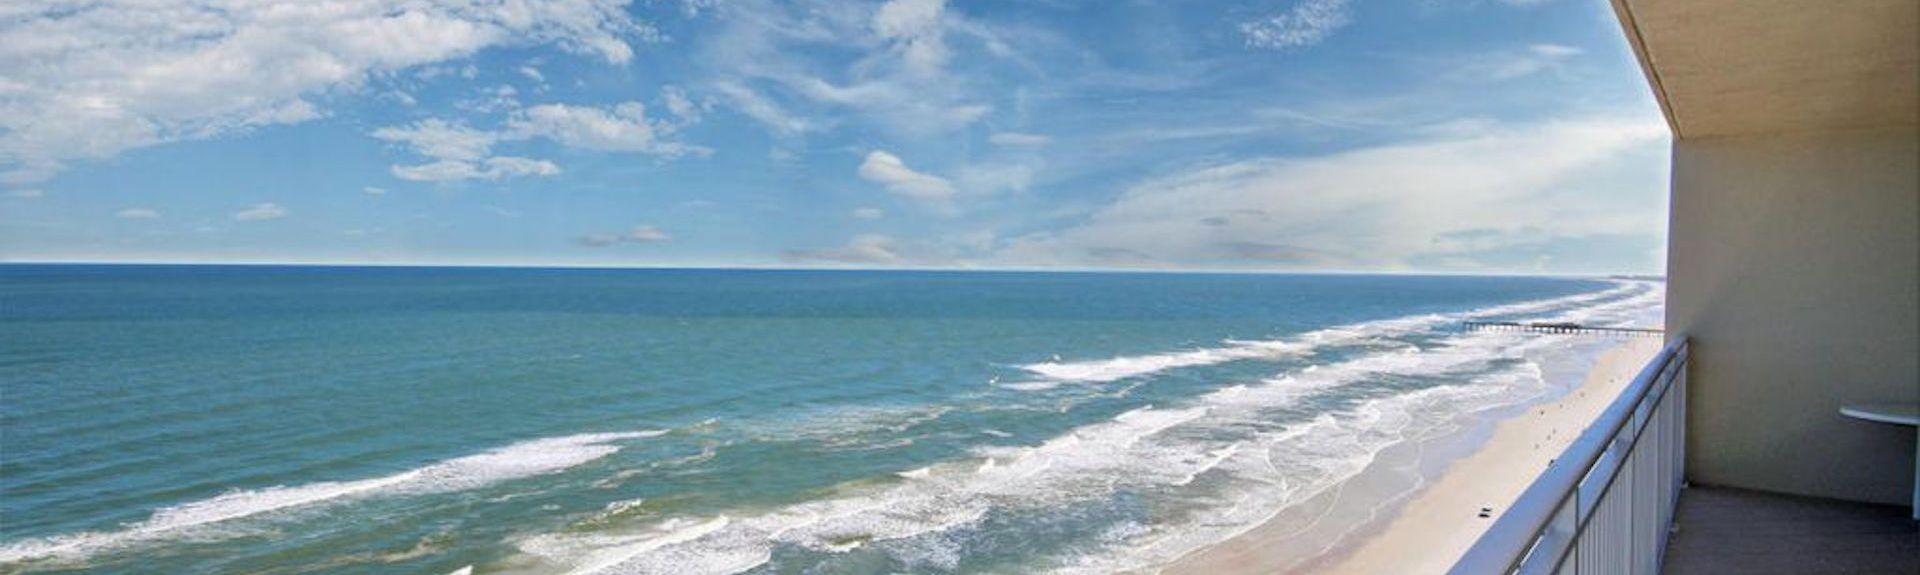 Grand Coquina Condo, Daytona Beach Shores, FL, USA